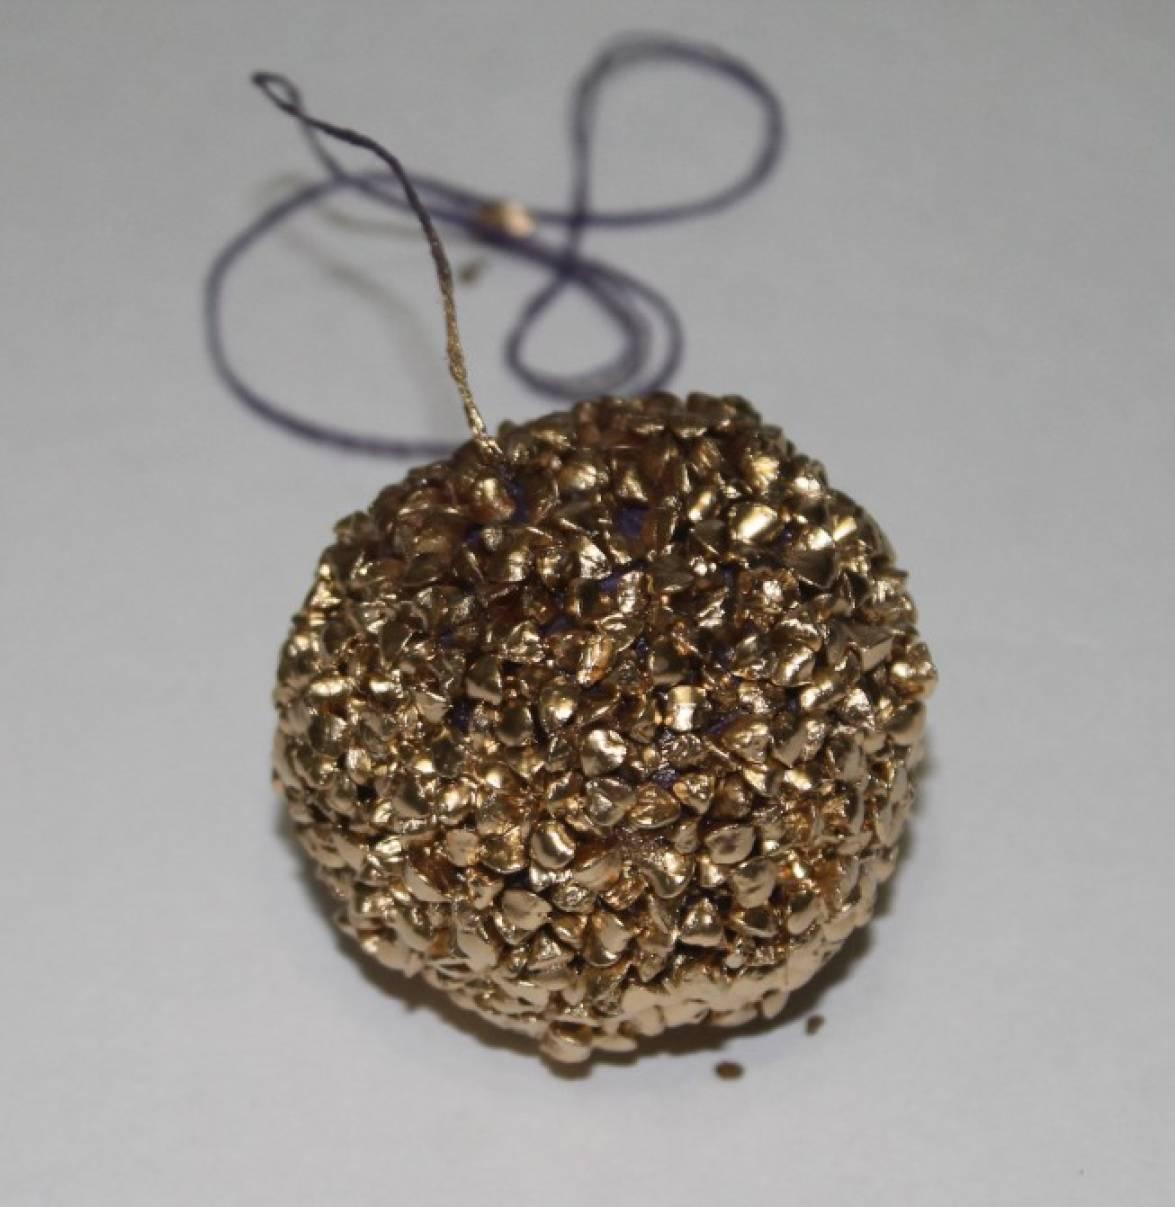 Мастер-класс «Новогодняя игрушка на ёлку— шар из крупы»